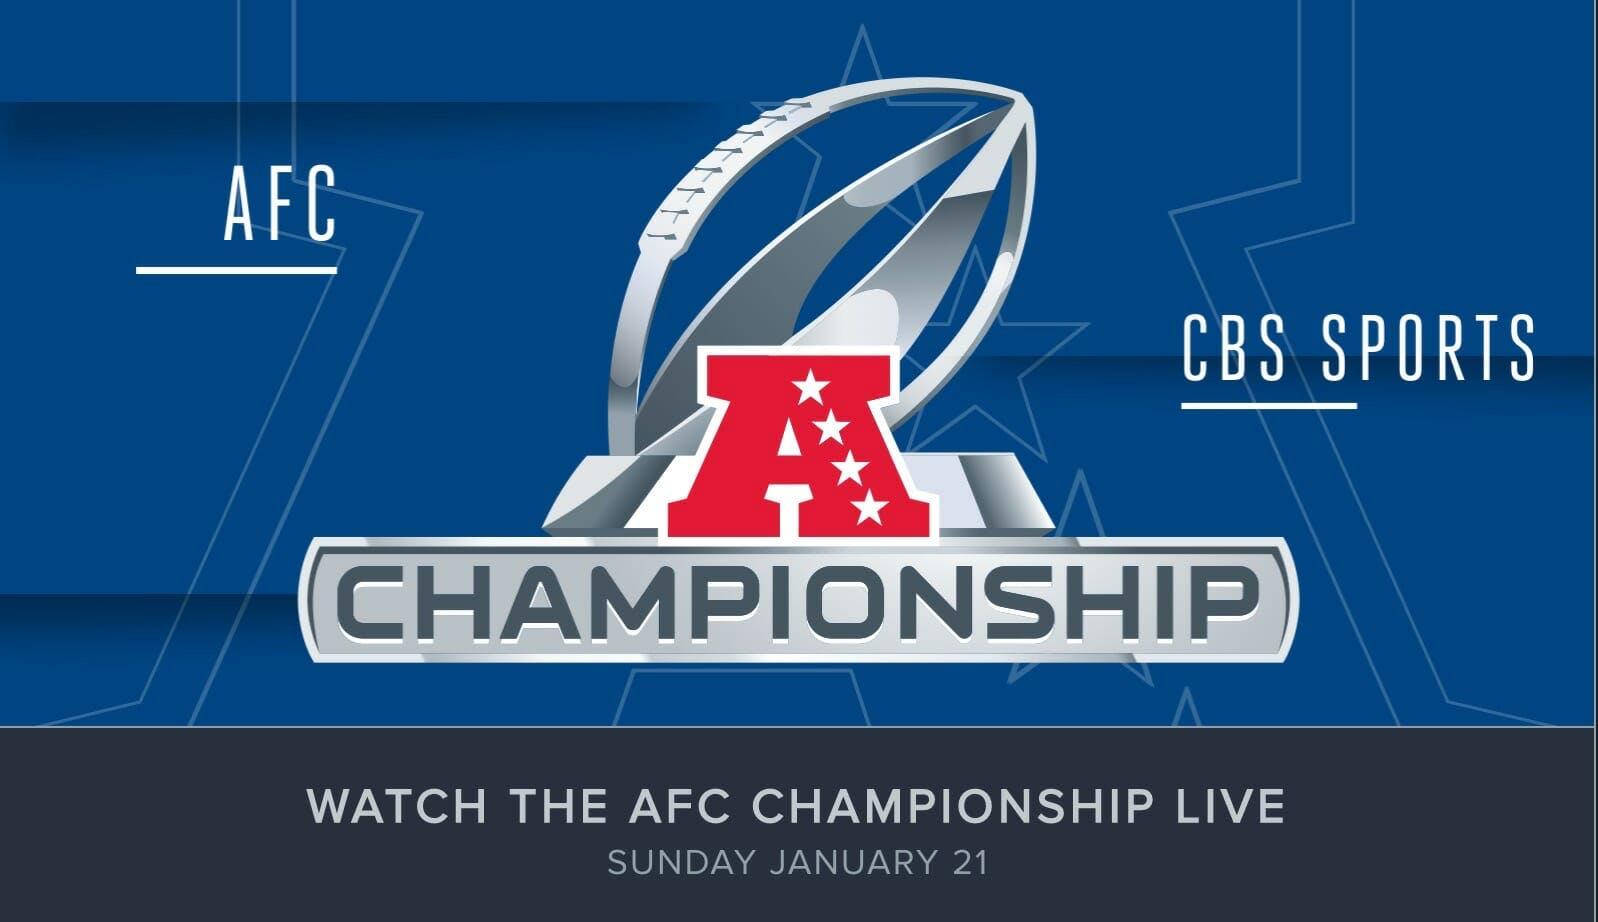 how to watch NFL playoffs online - CBS Sports